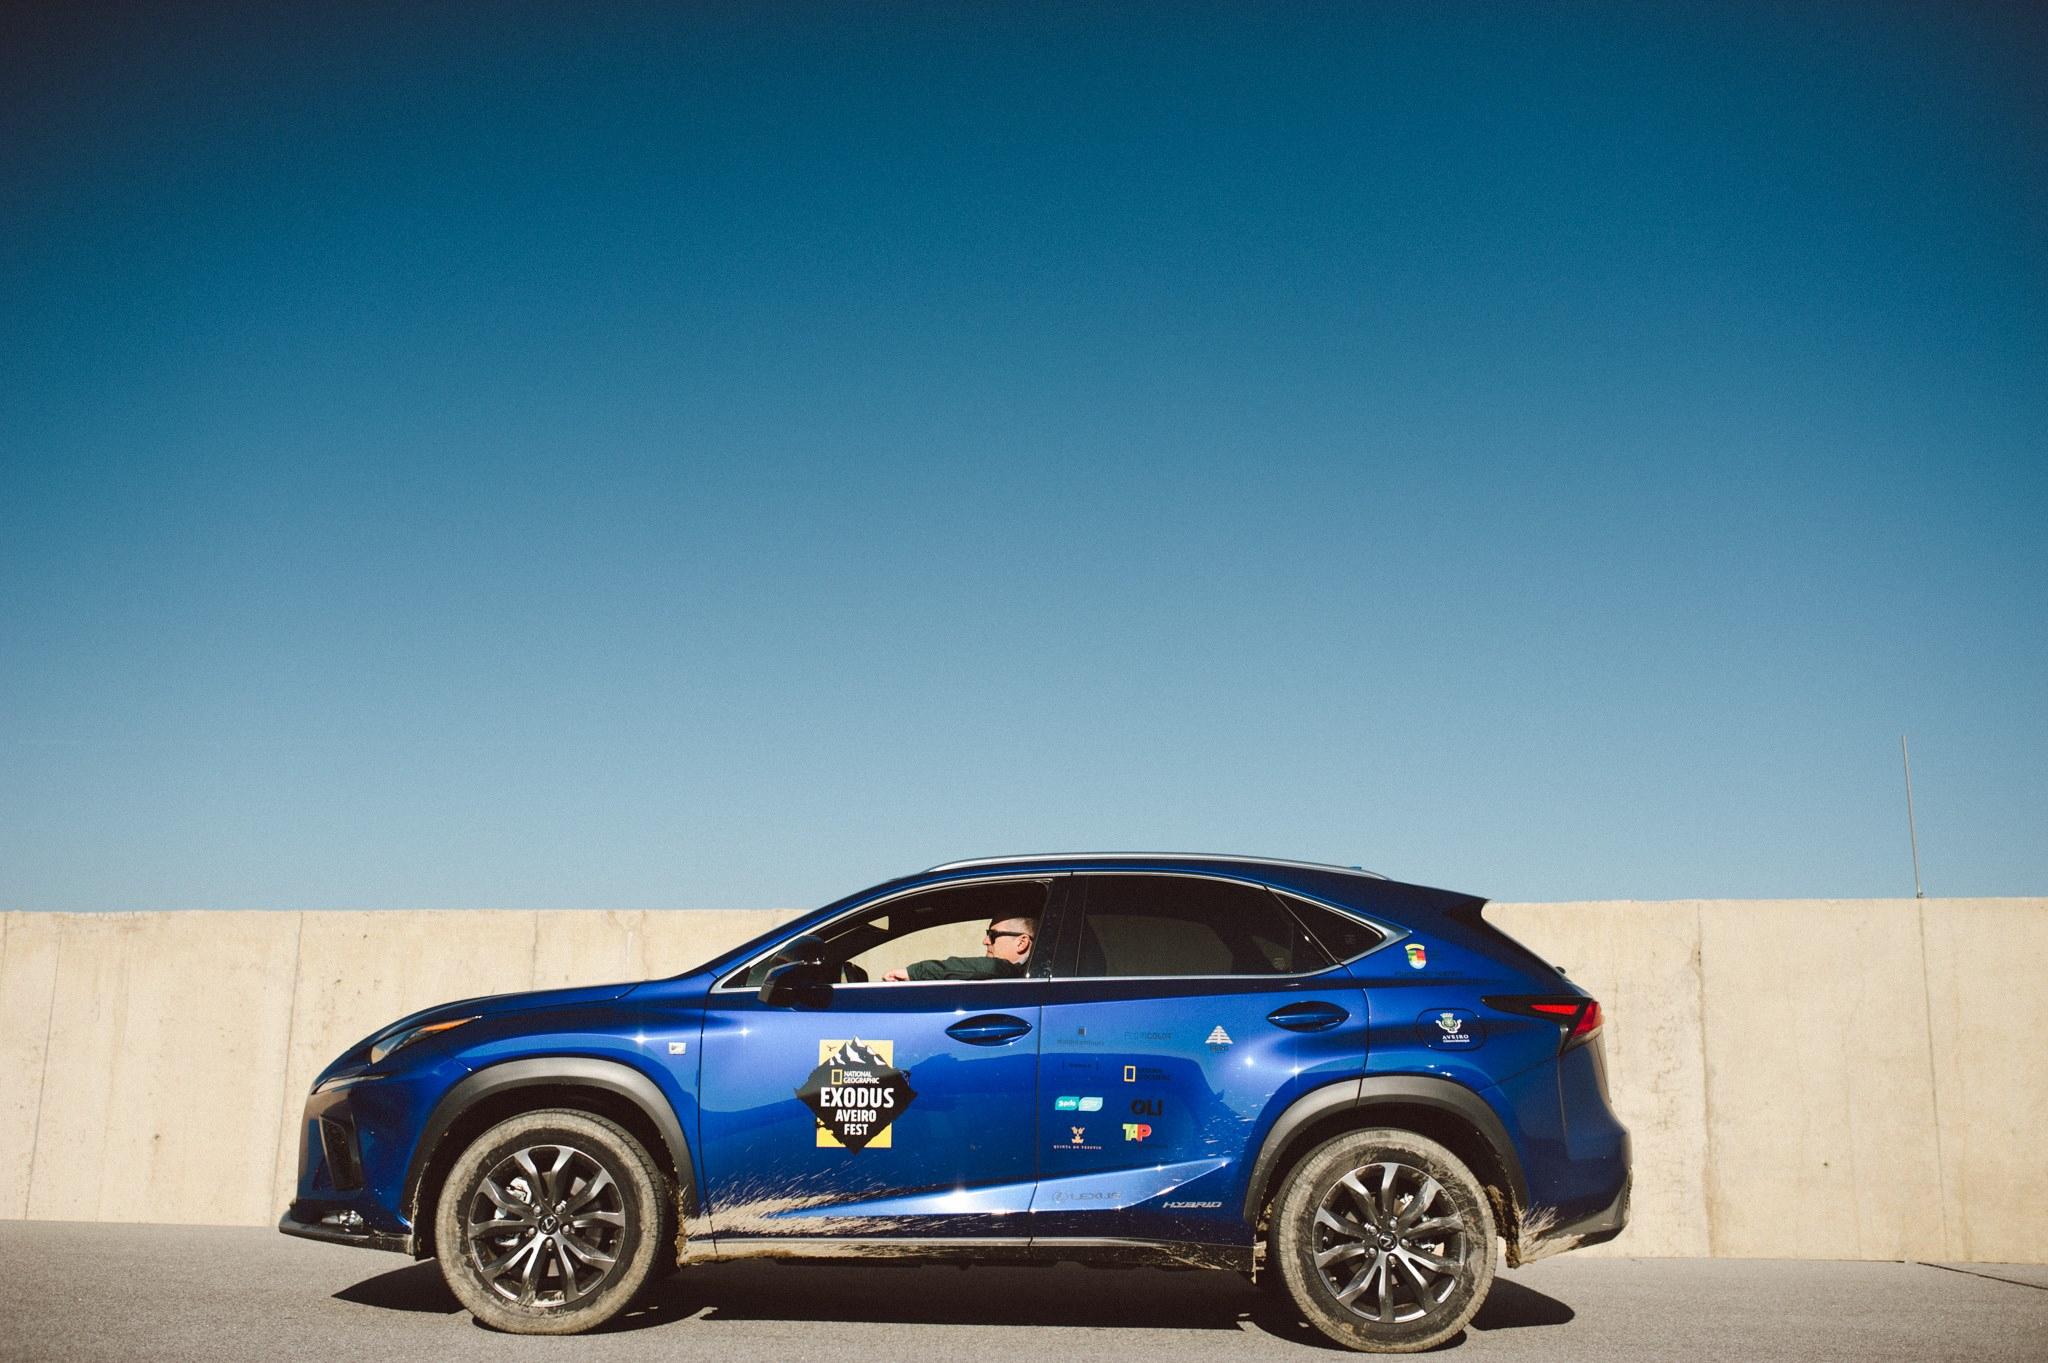 Lexus associa se ao National Geographic exodus Aveiro Fest